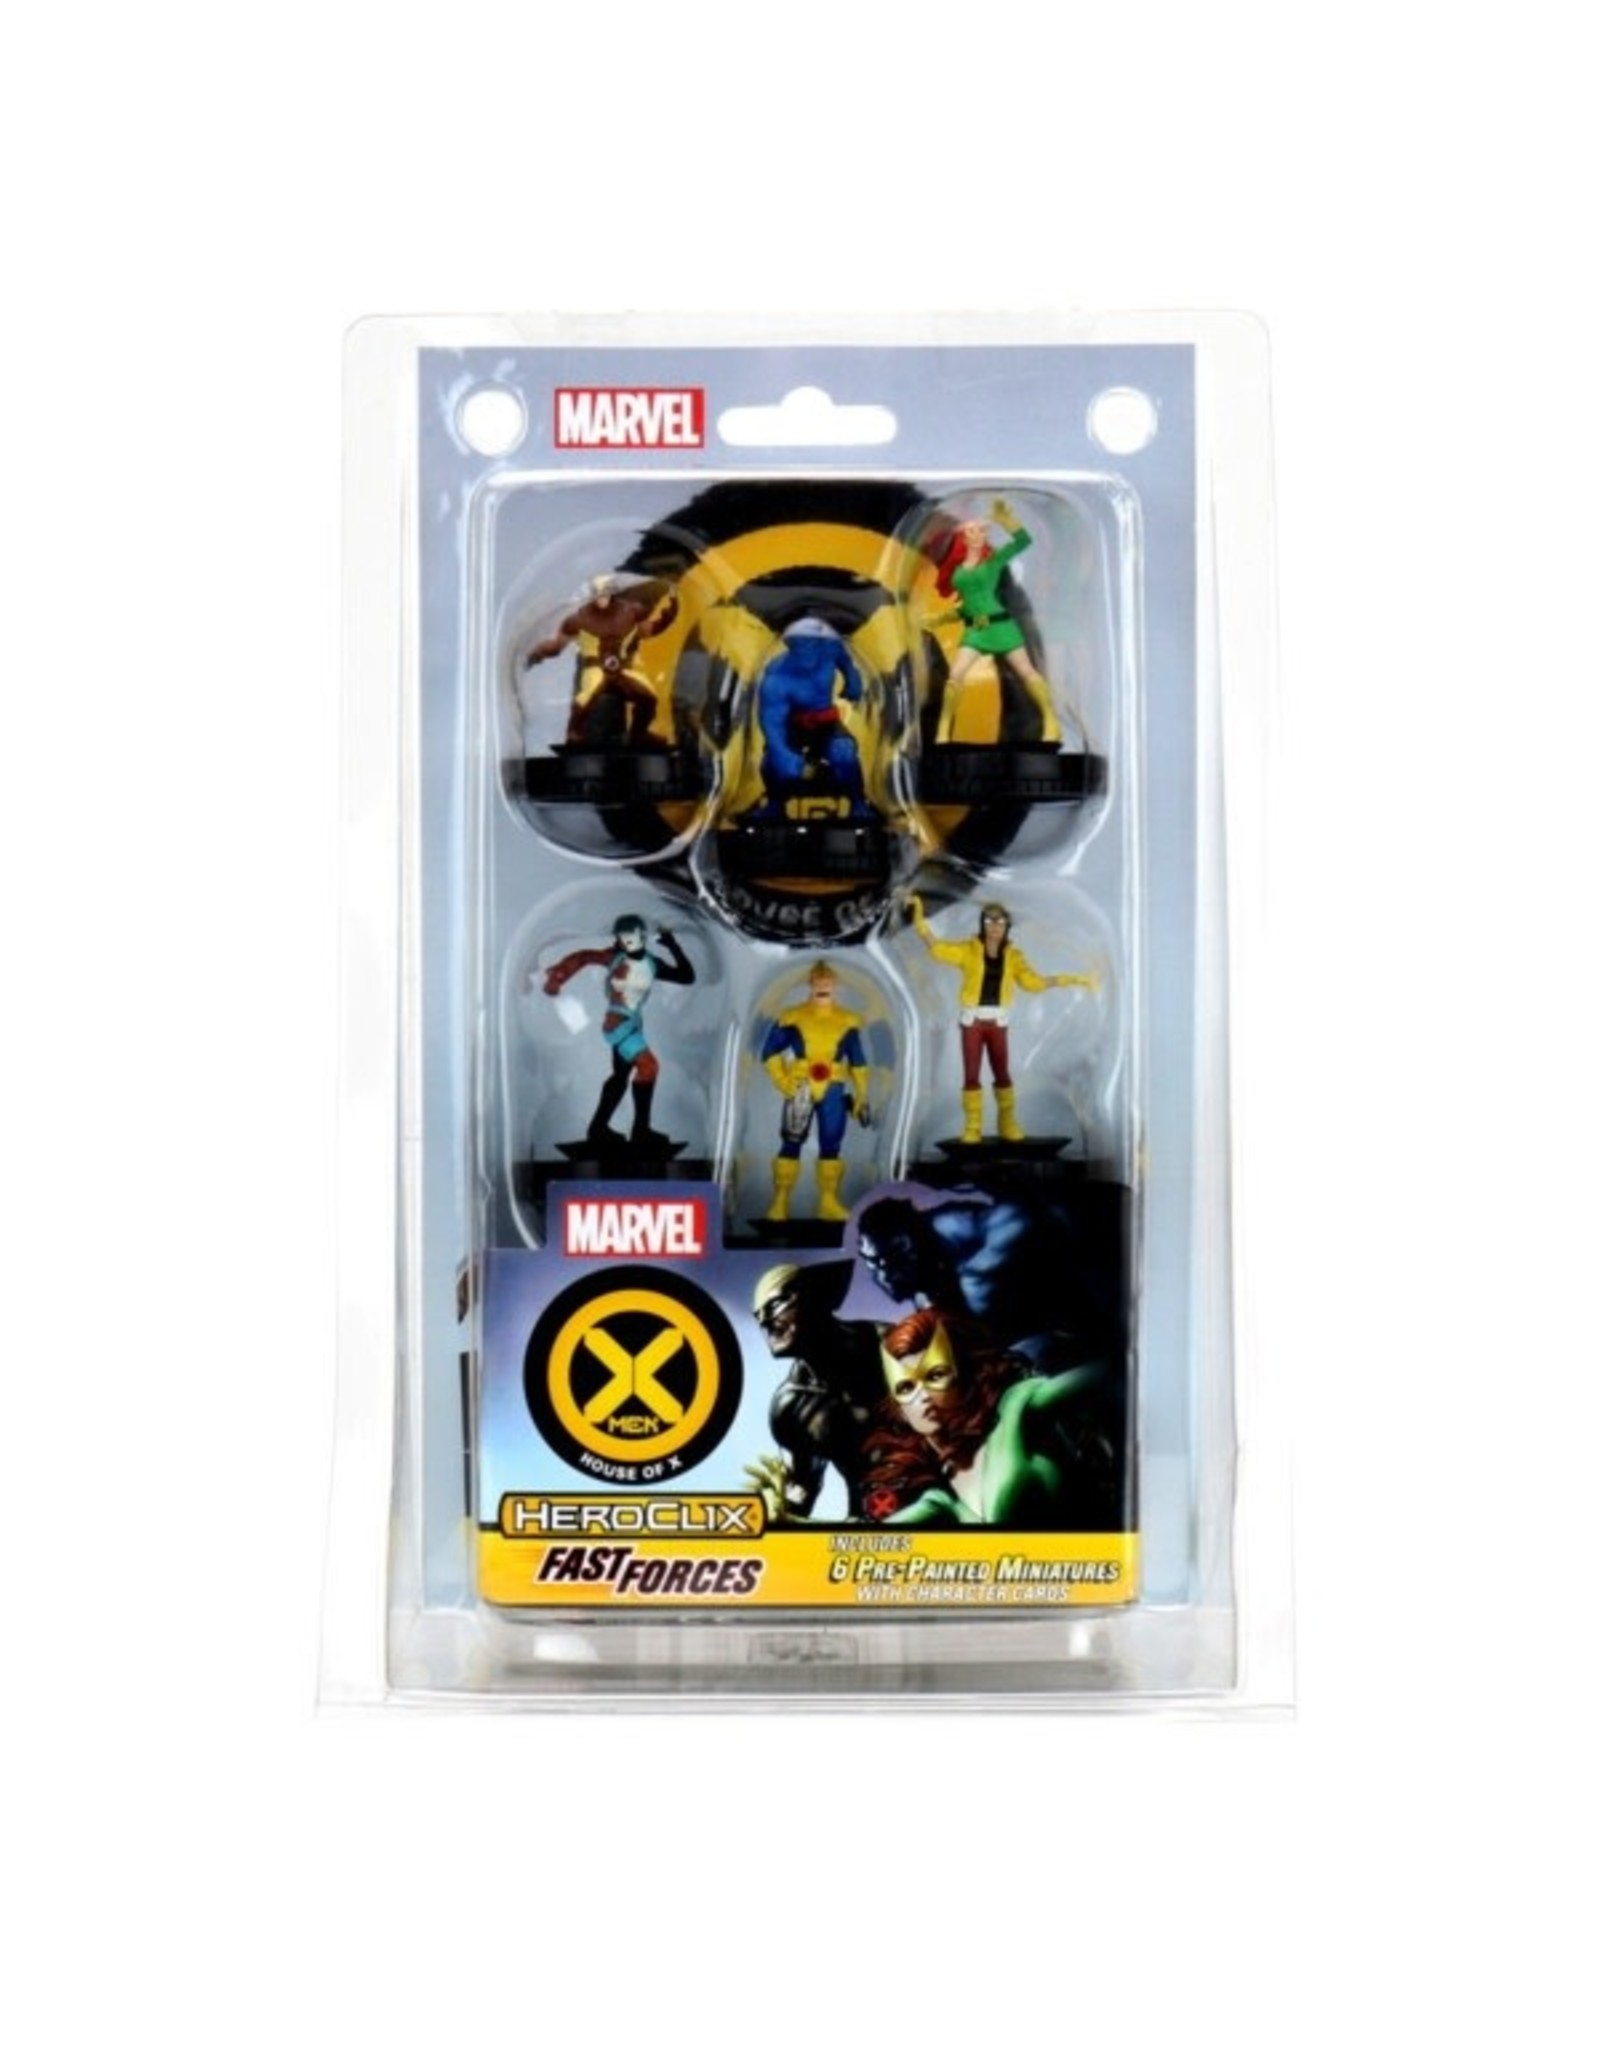 Wizkids X-Men House of X Fast Forces - Marvel Heroclix